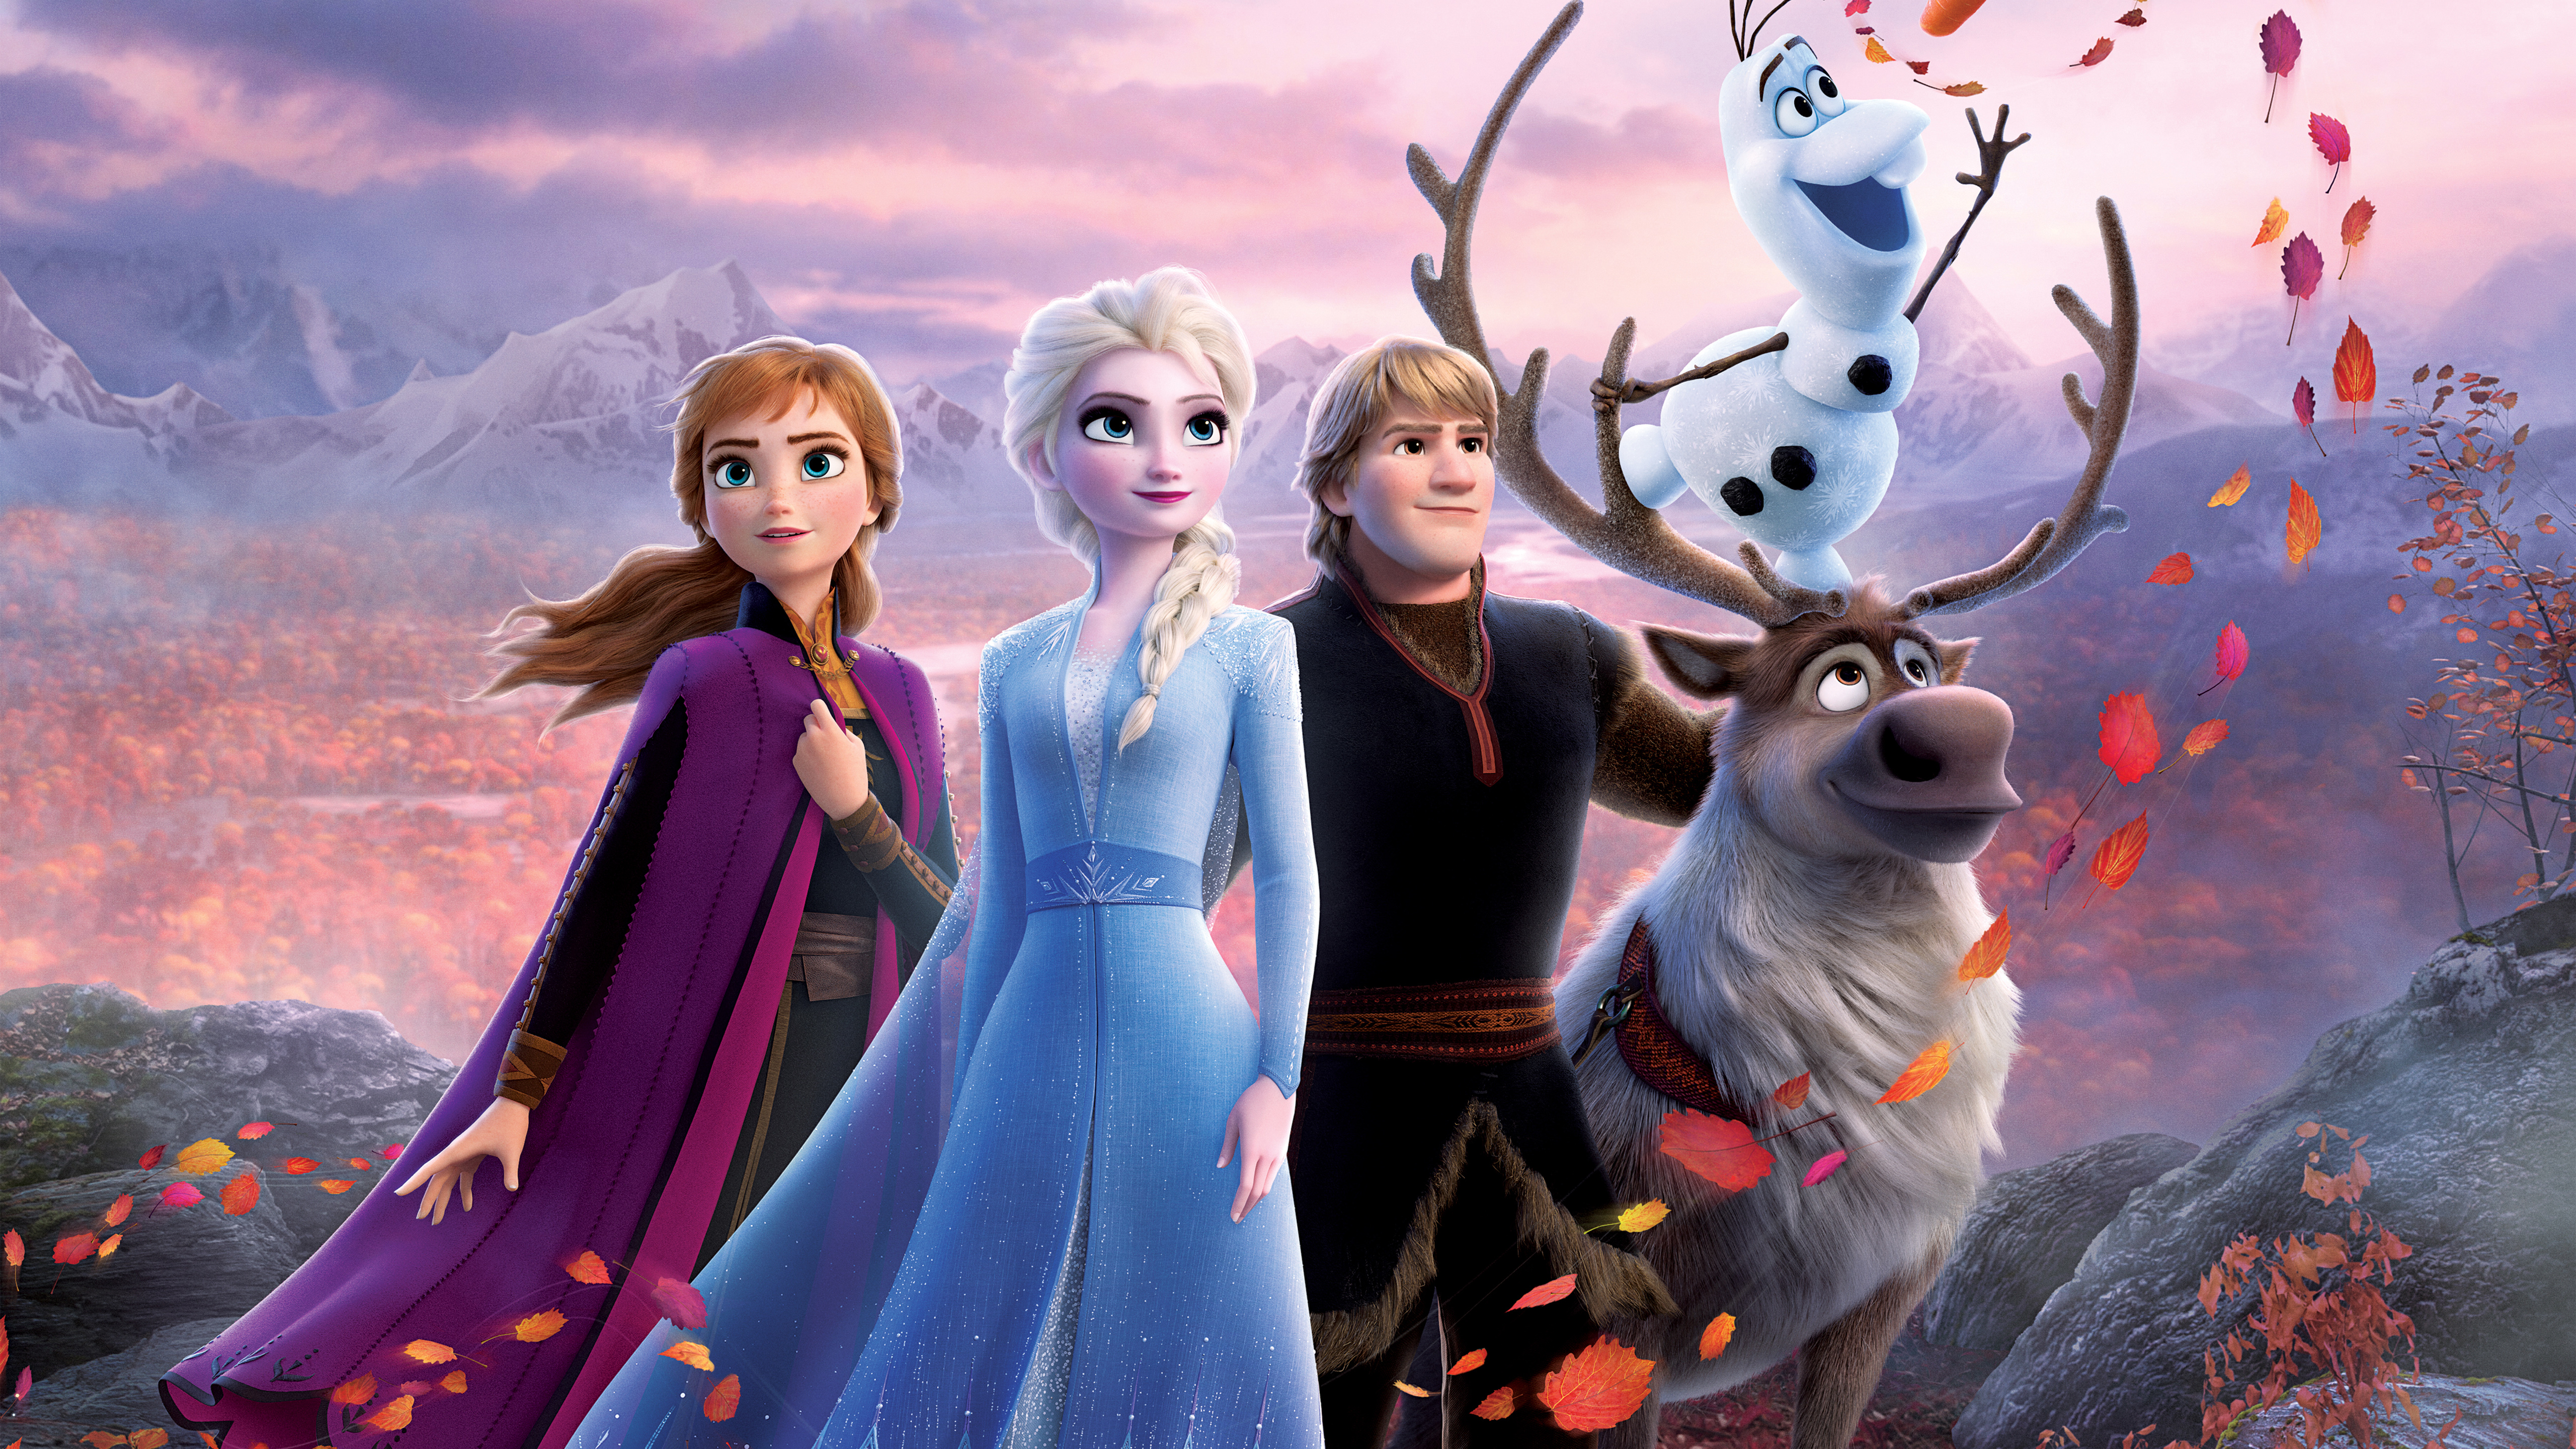 wallpaper de frozen,animated cartoon,reindeer,cg artwork,animation,illustration